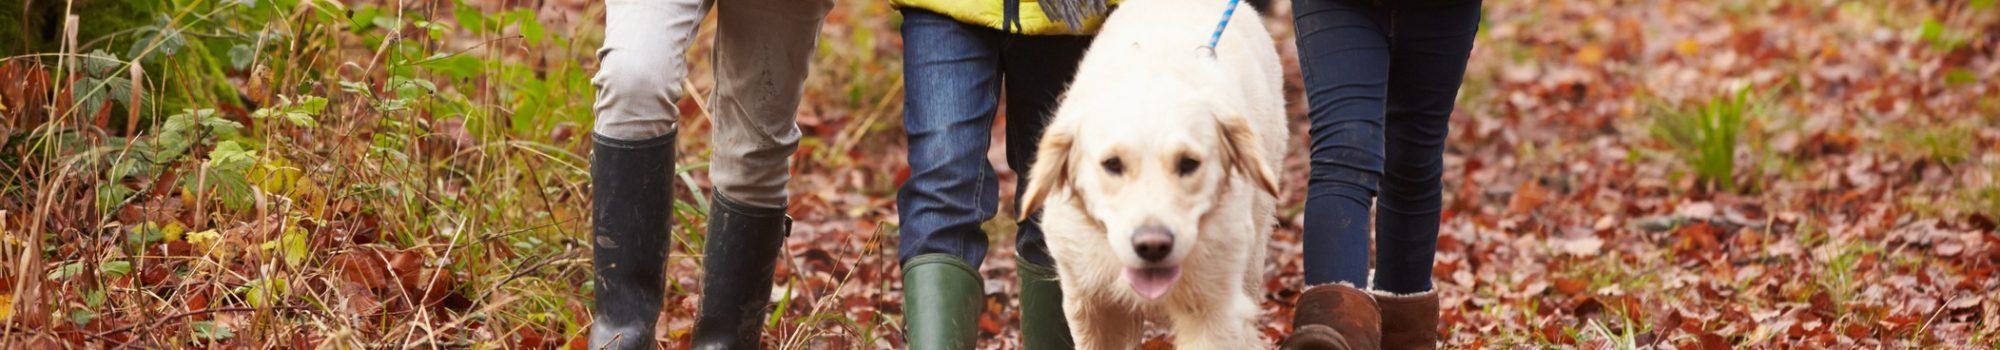 Dog friendly winter walk in Whitby